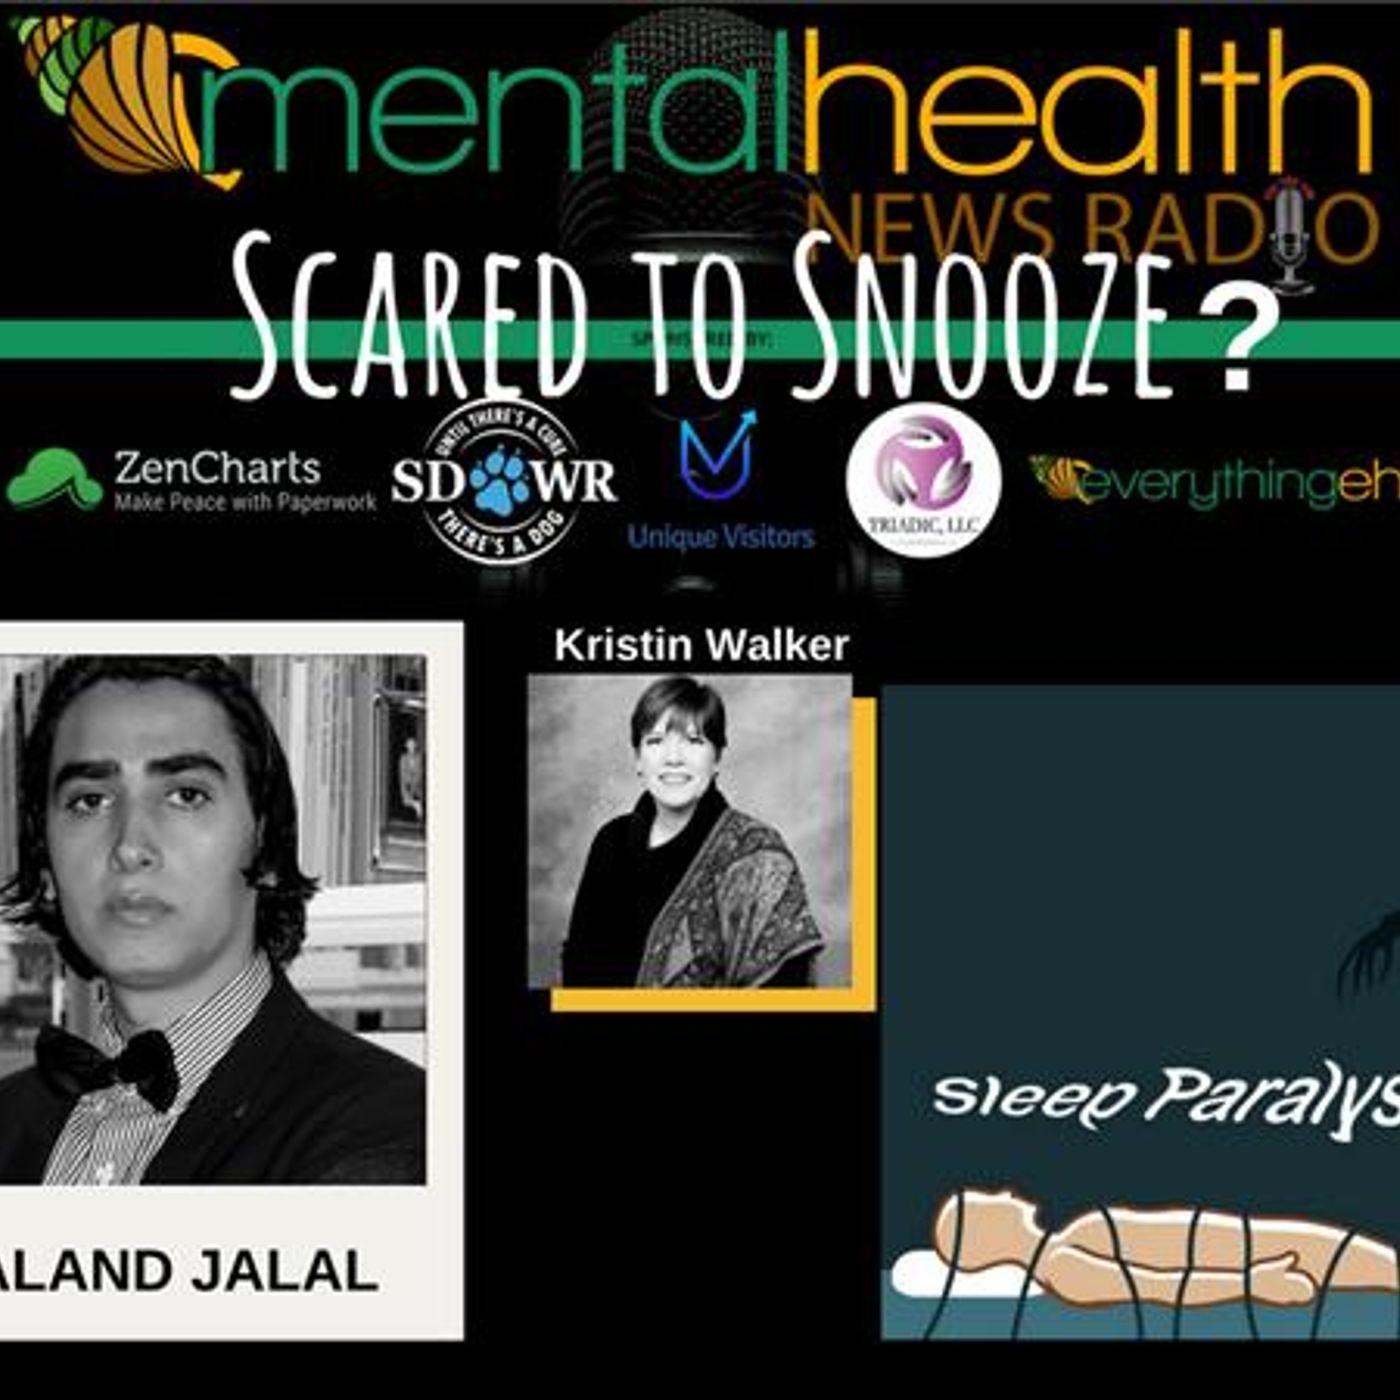 Mental Health News Radio - Scared to Snooze? A Look at Sleep Paralysis with Baland Jalal